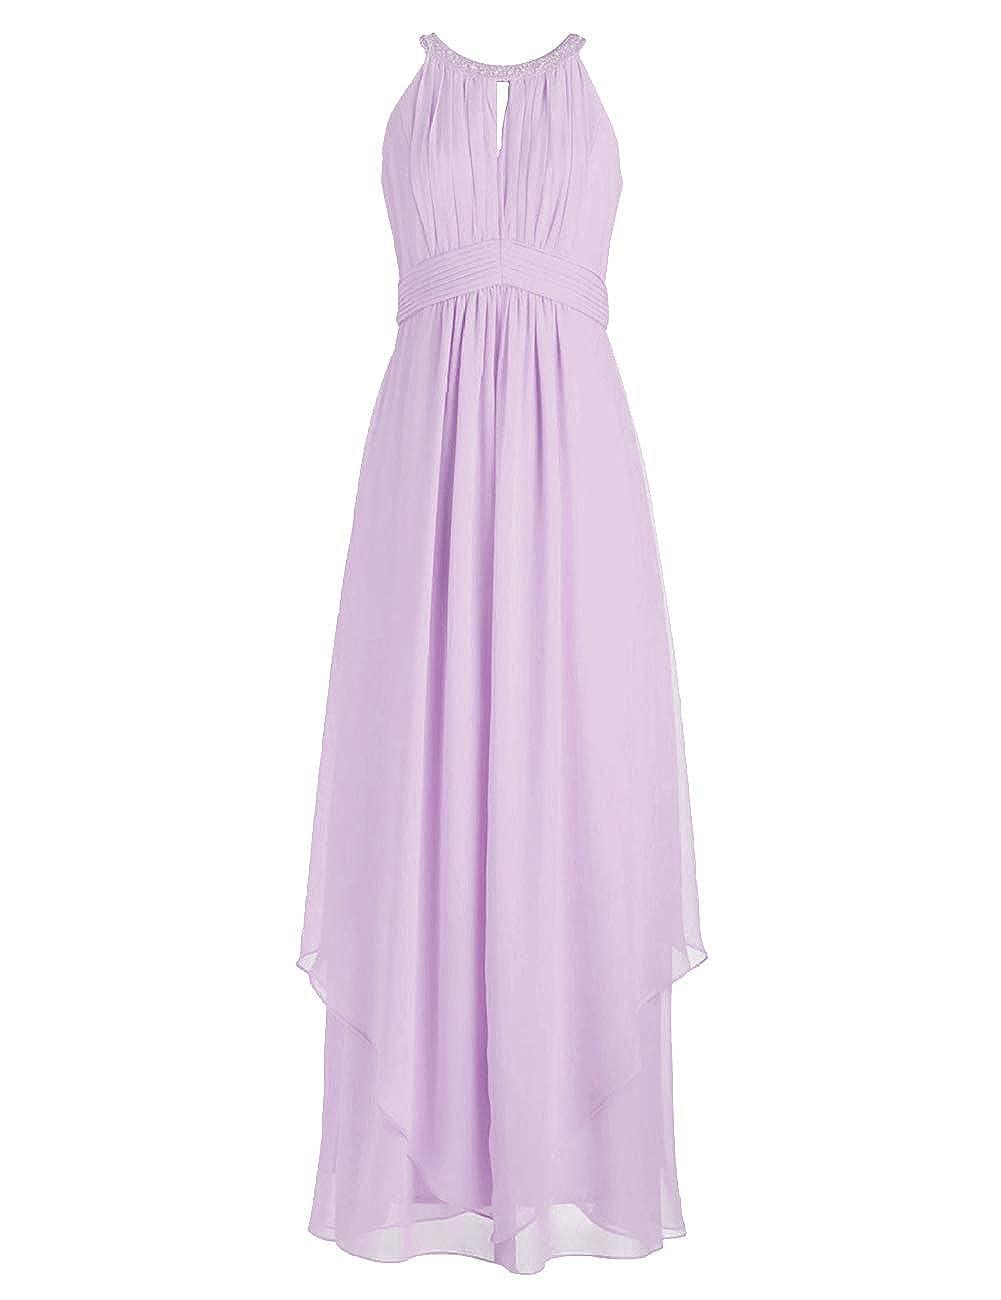 Lavender Bridesmaid Dresses Halter Evening Party Dress Long Bridesmaid Gowns Ruffles